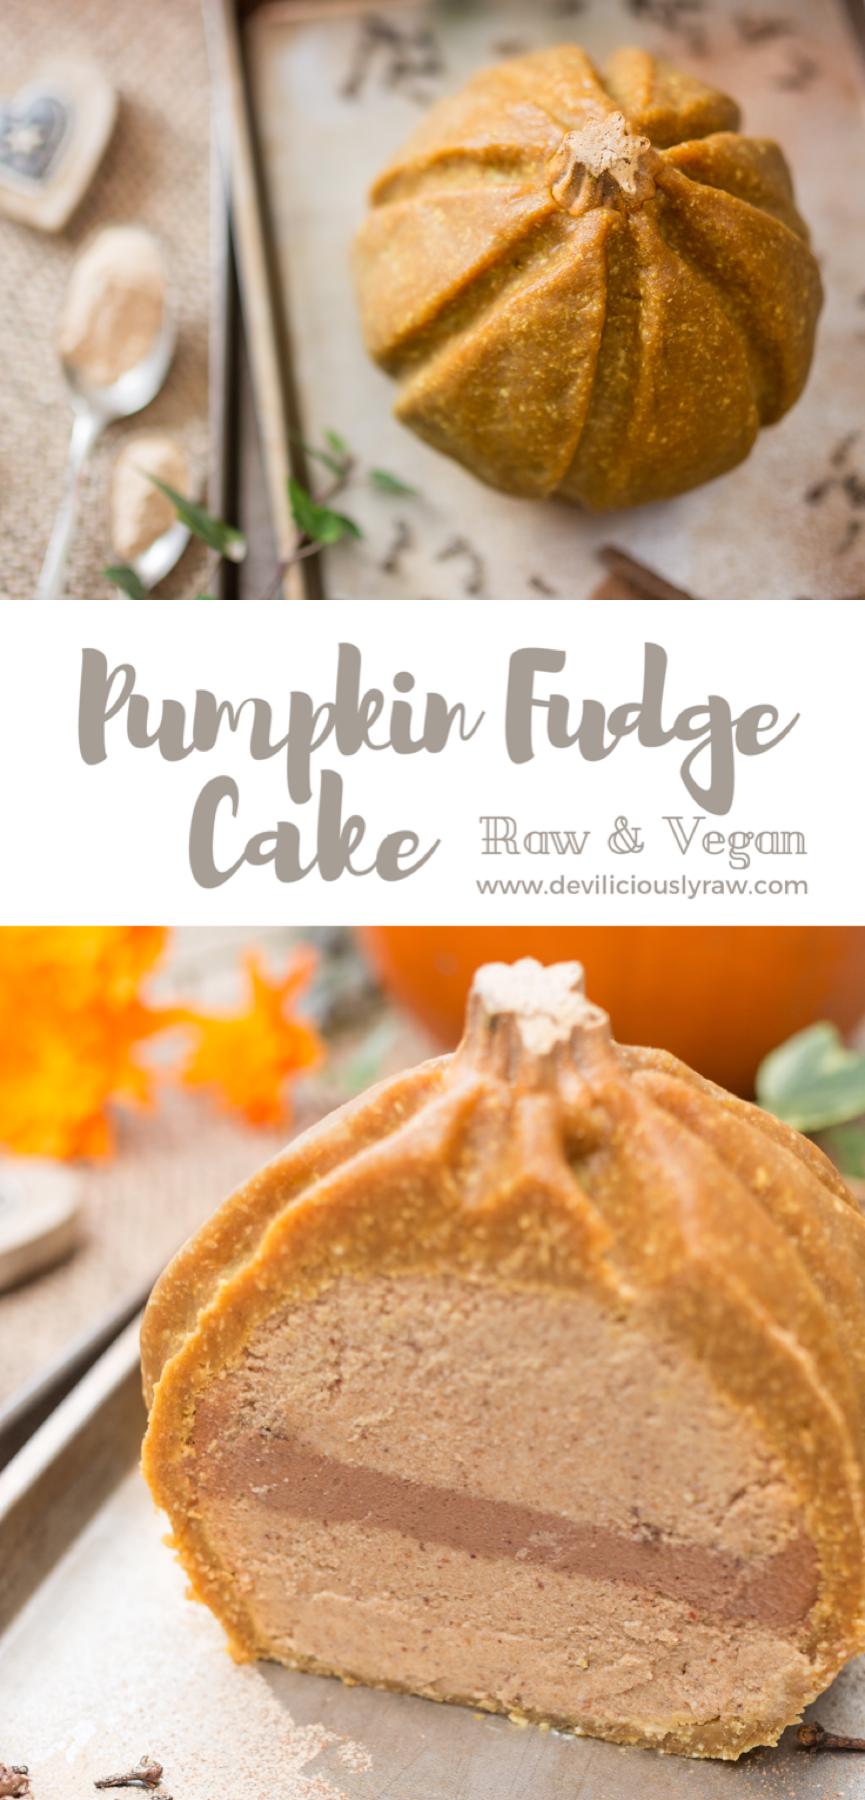 Pumpkin Fudge Cake